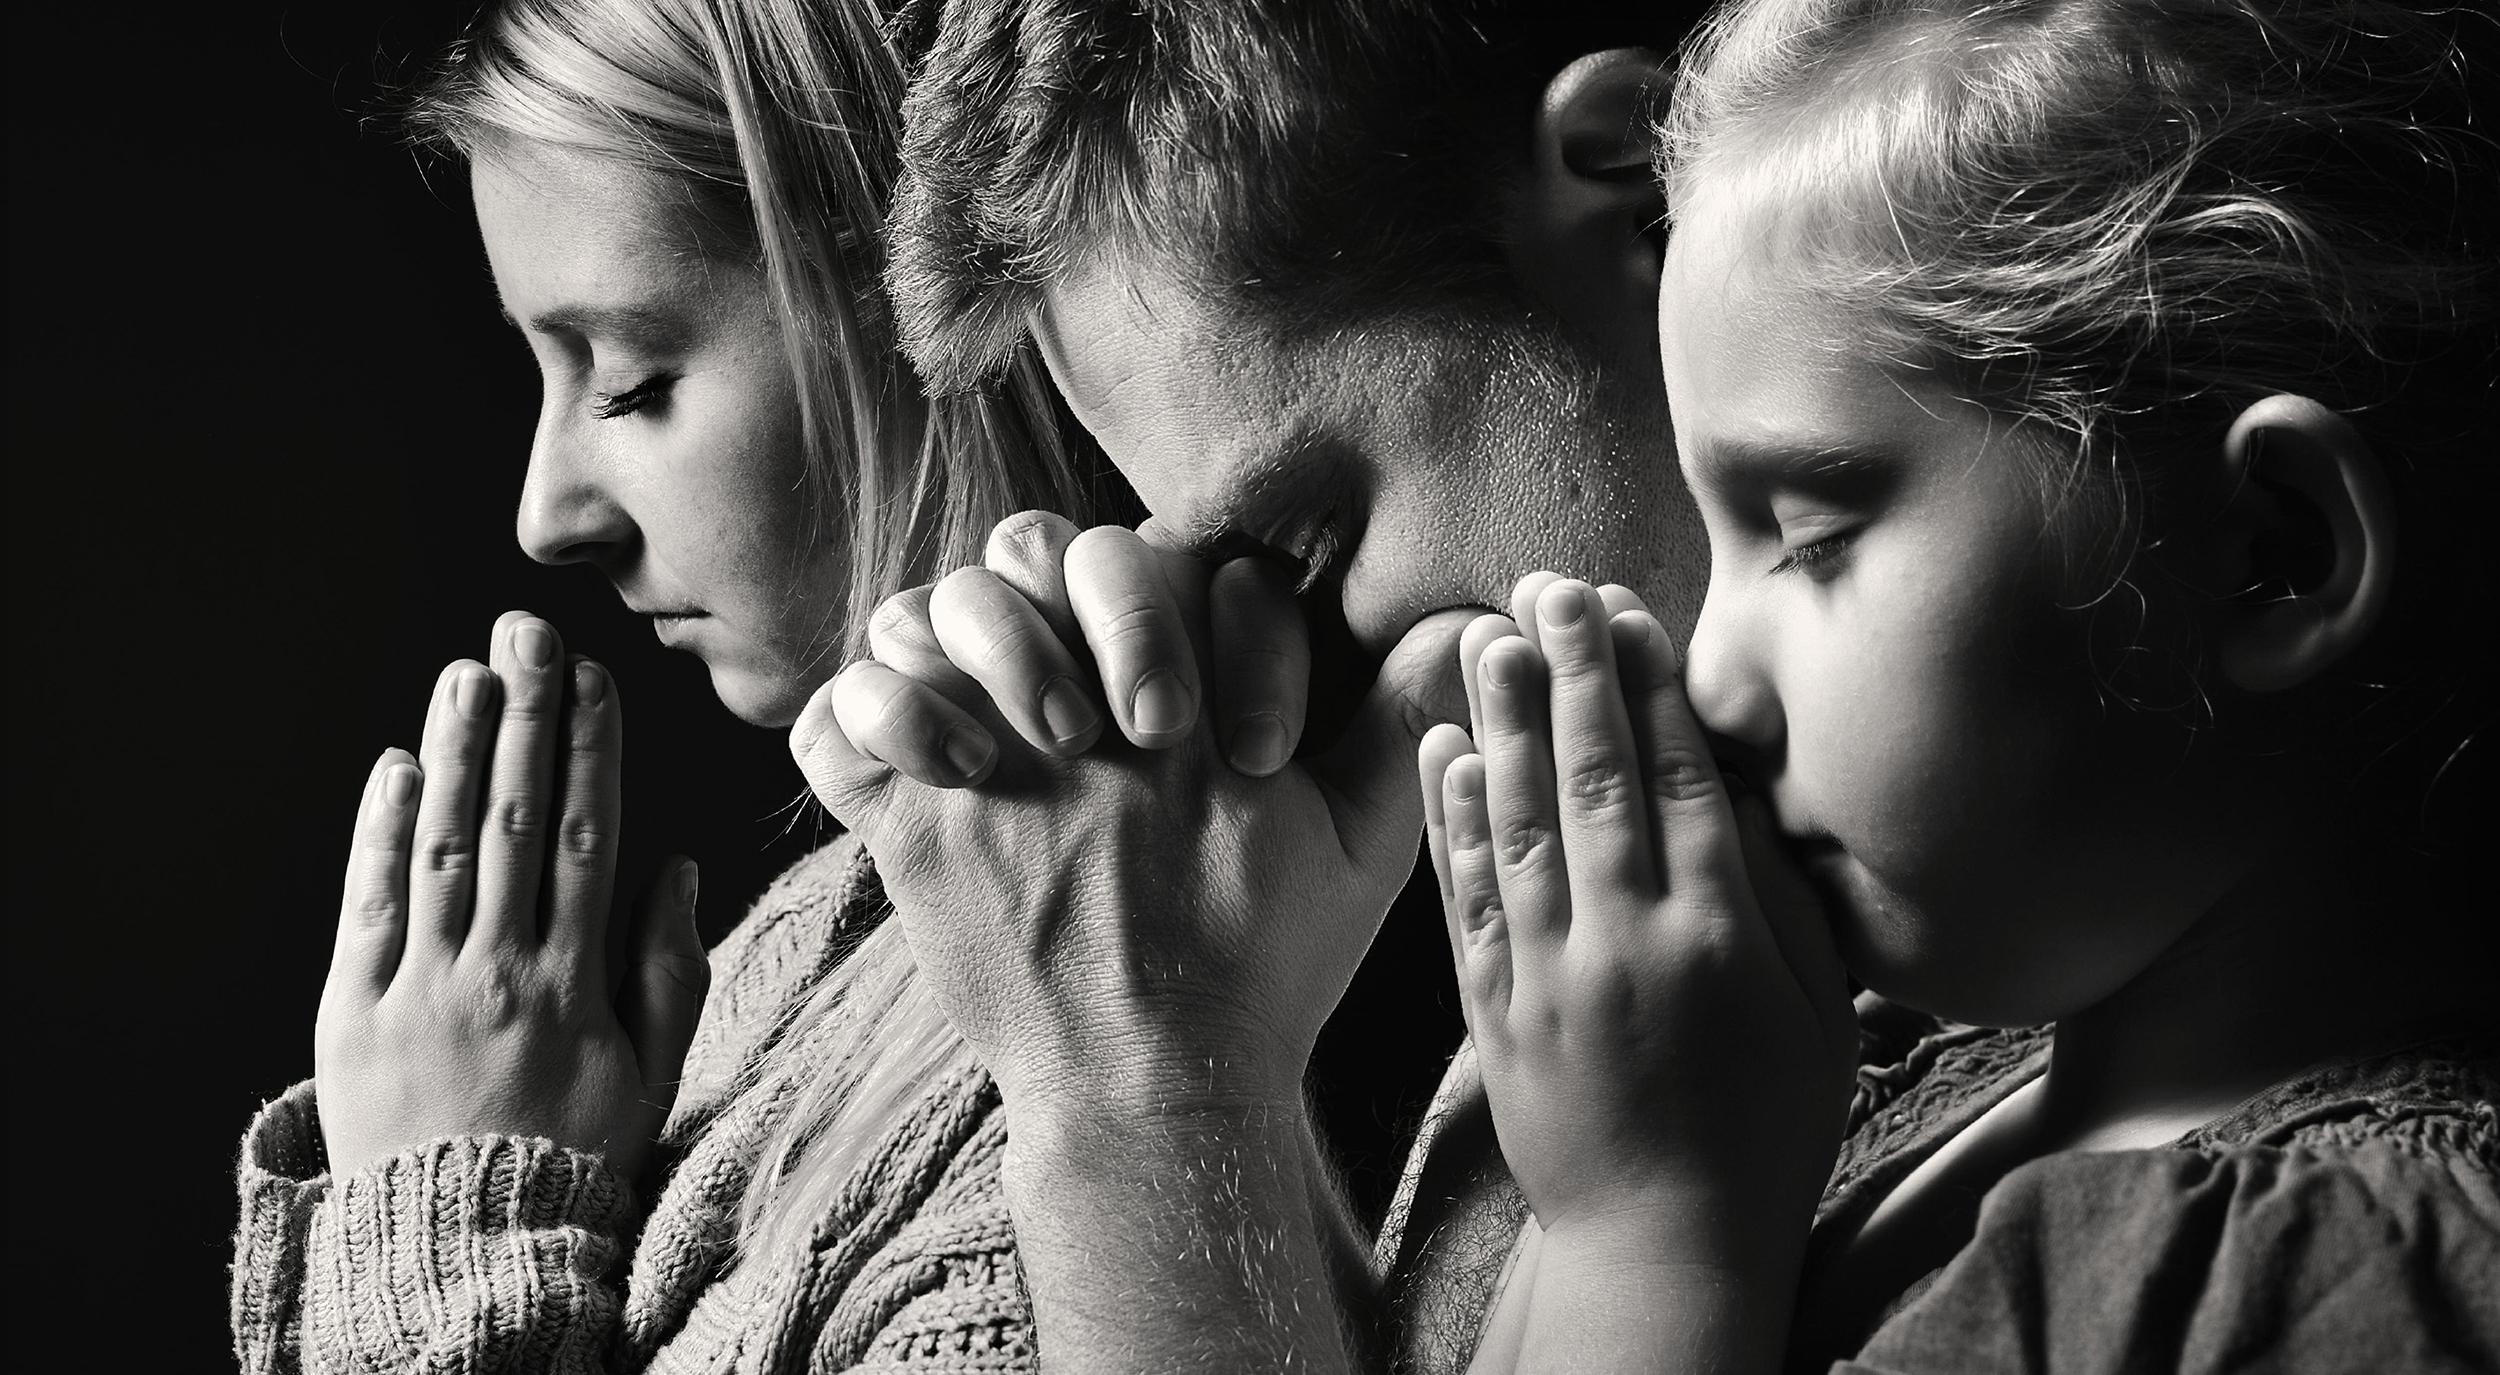 Mom, dad and daughter worshiping